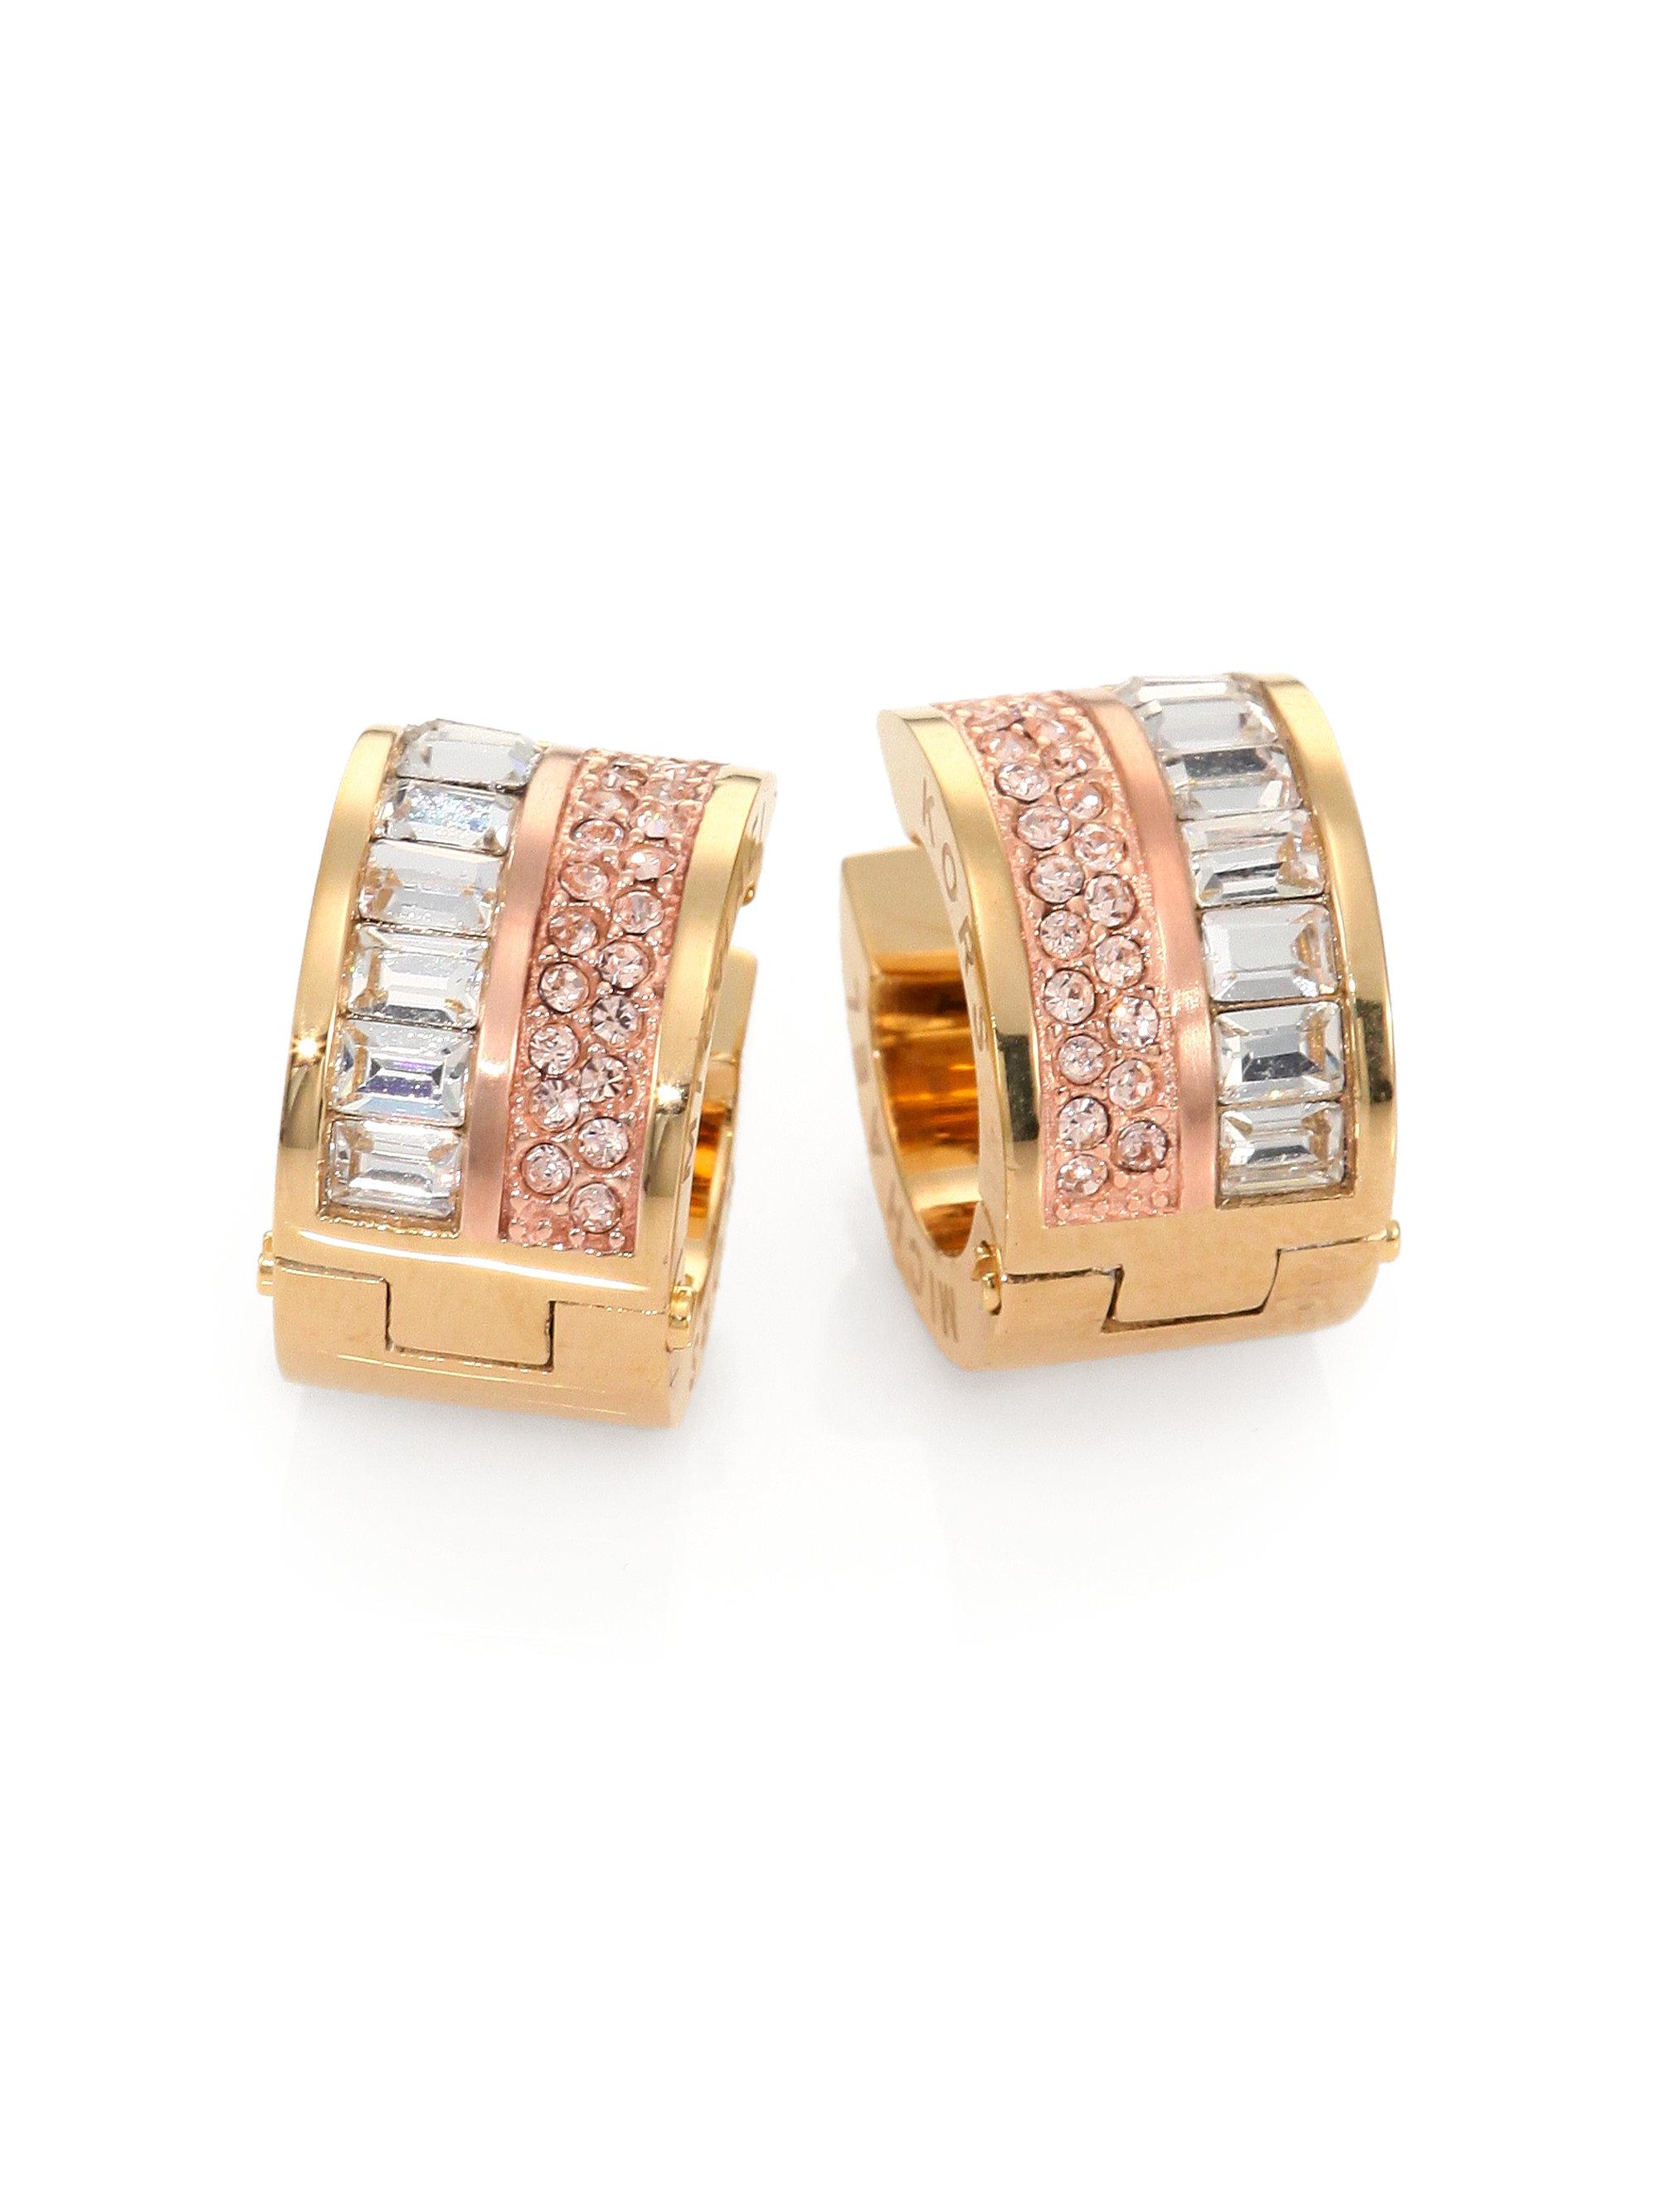 34203352816a Lyst - Michael Kors Baguette Pave Twotone Huggie Earrings in Metallic